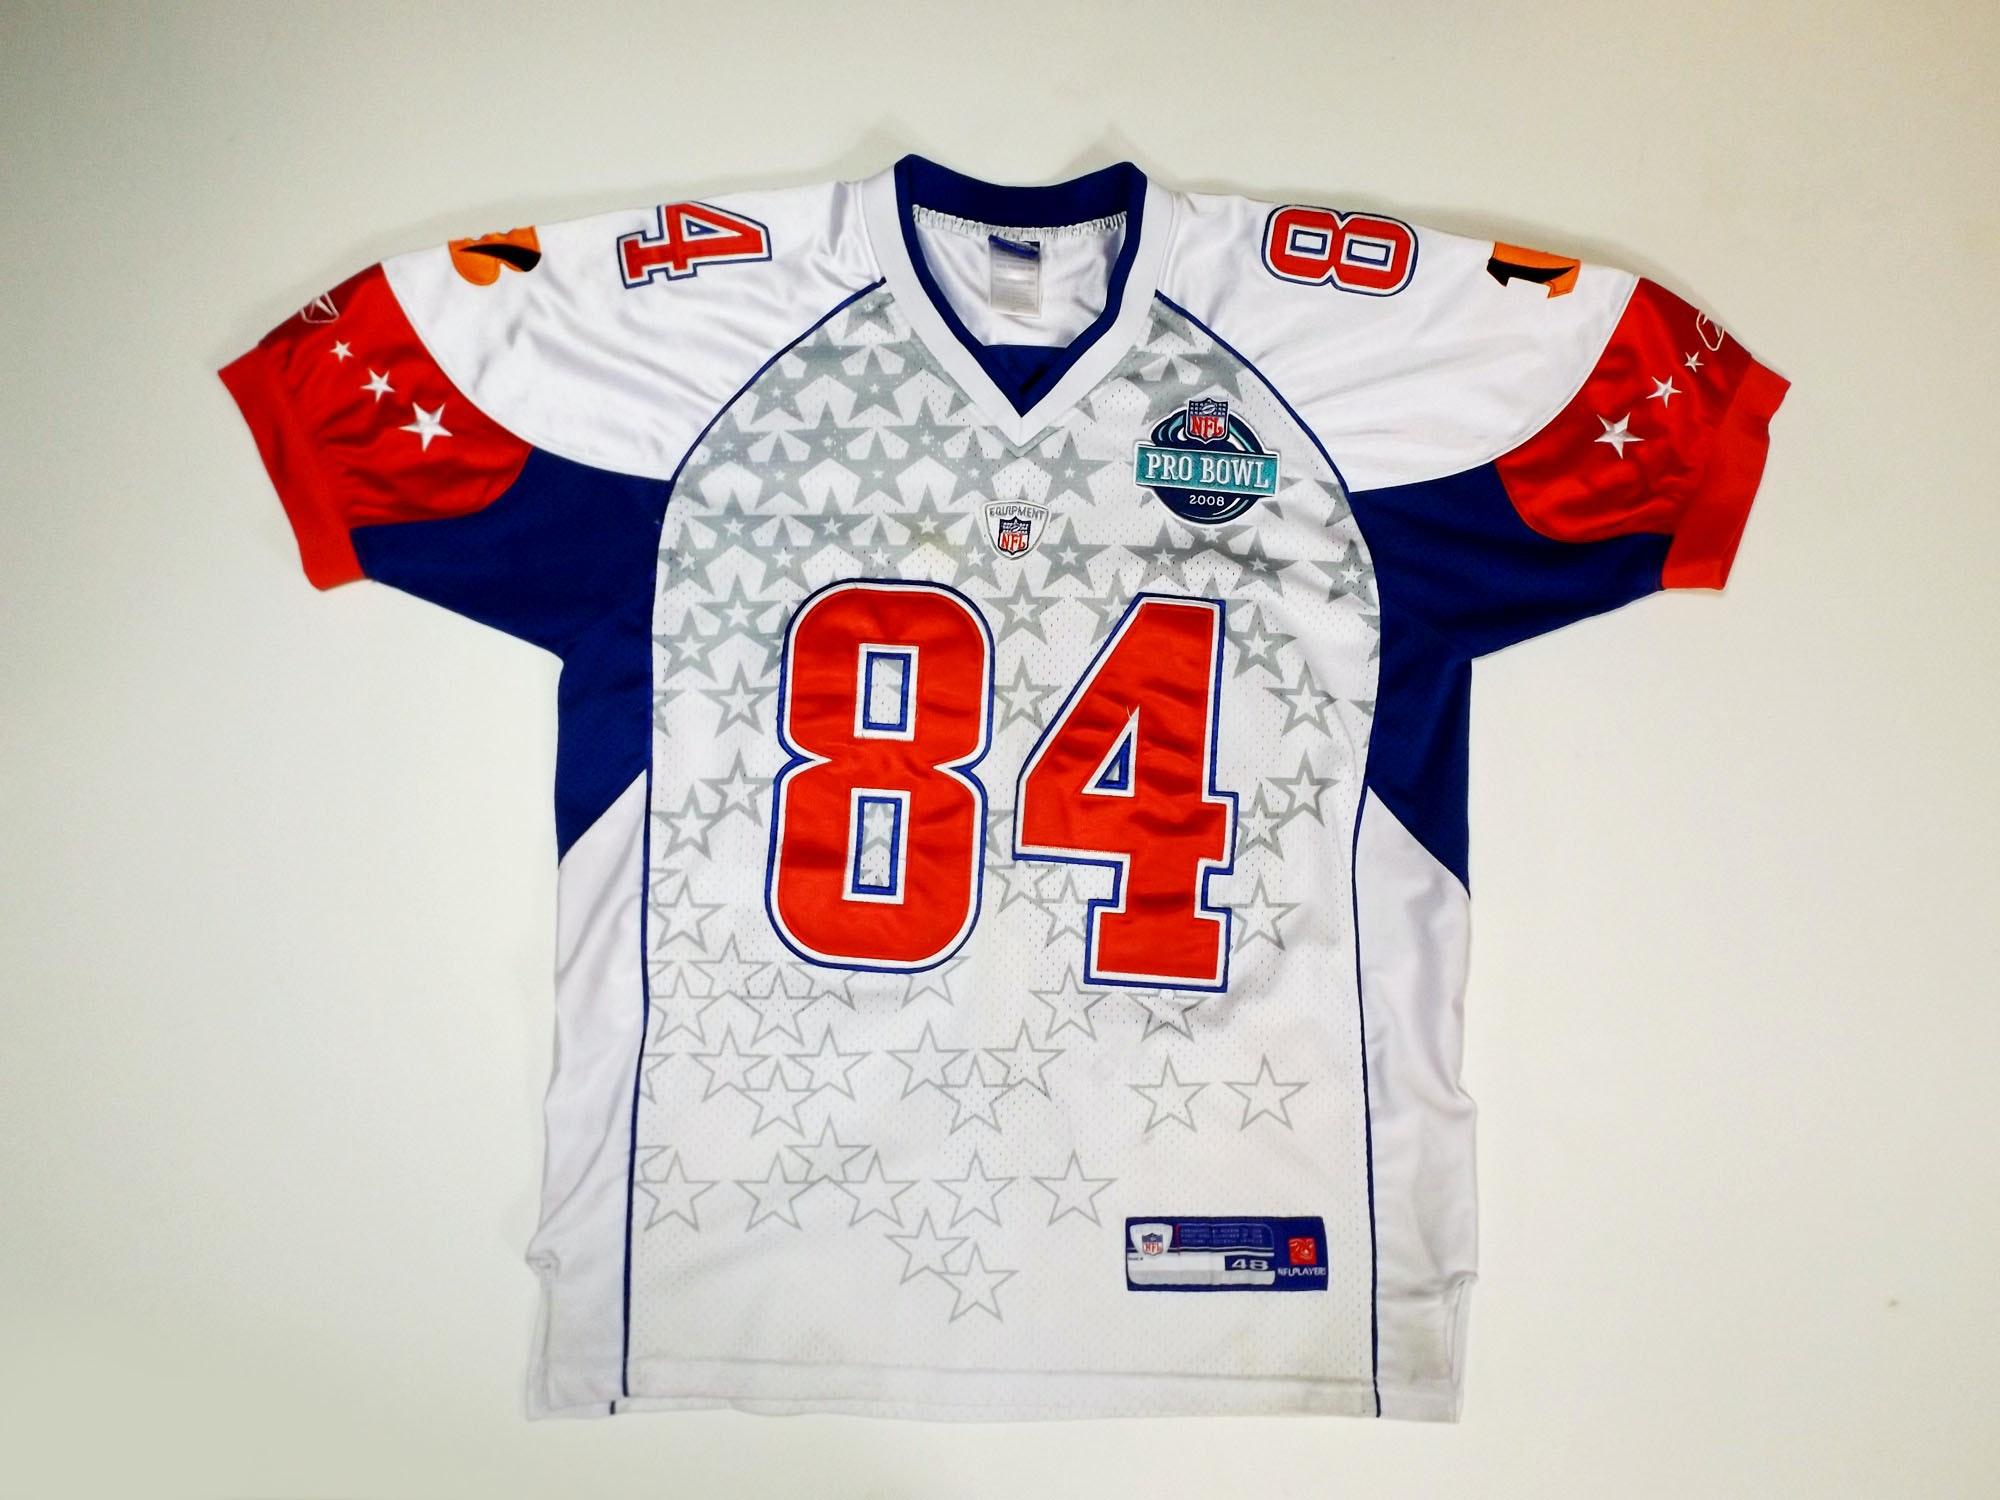 2008 Bengals Houshmandzadeh NFL Pro Bowl Jersey